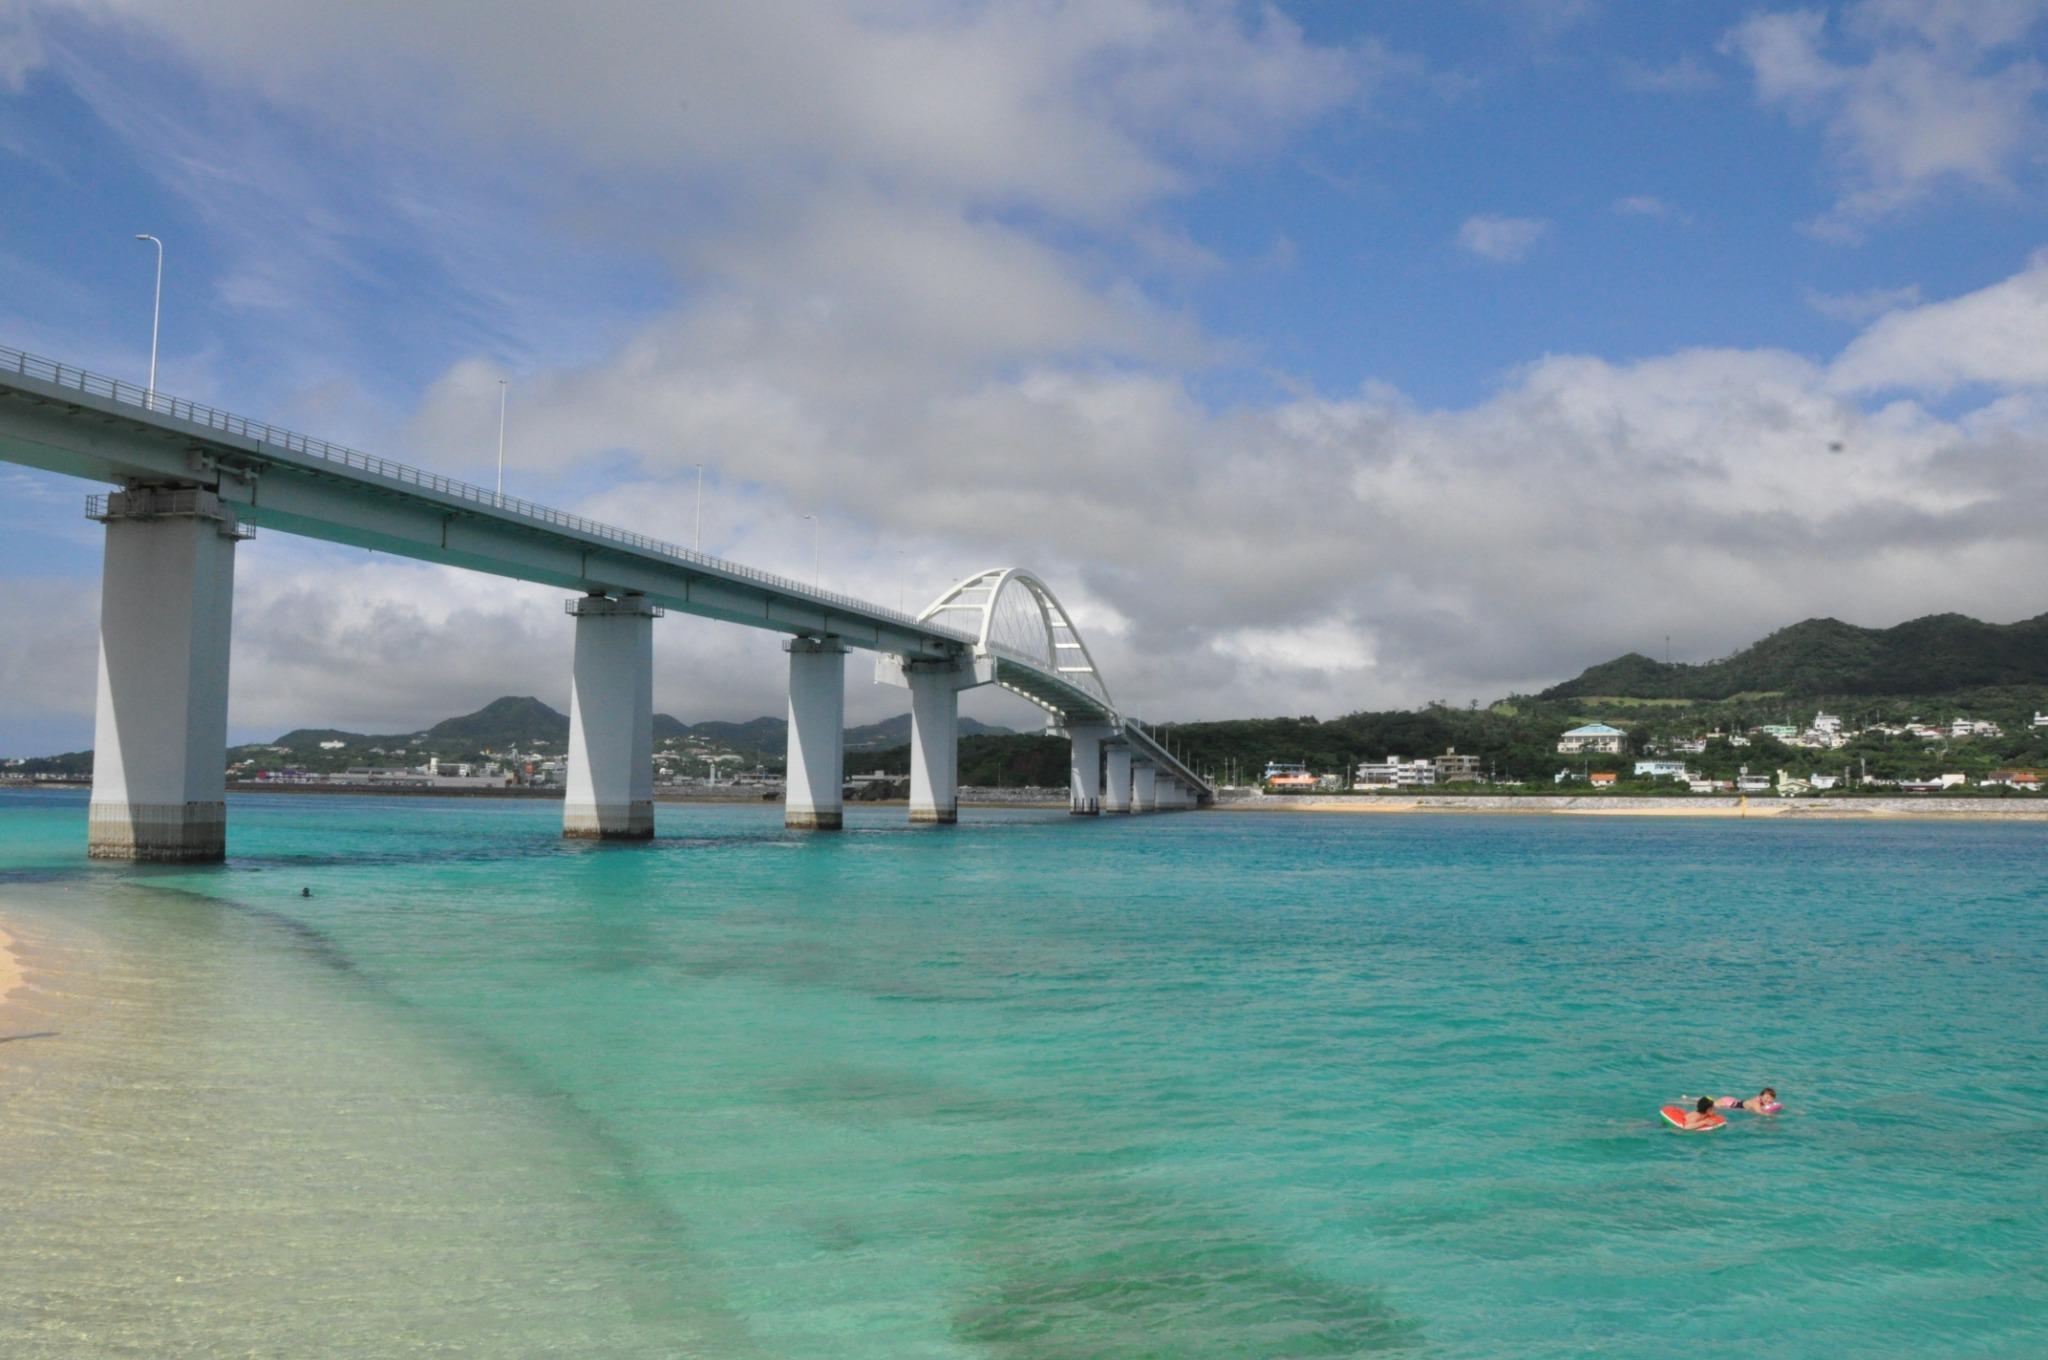 Sesoko beach 17minutes by car